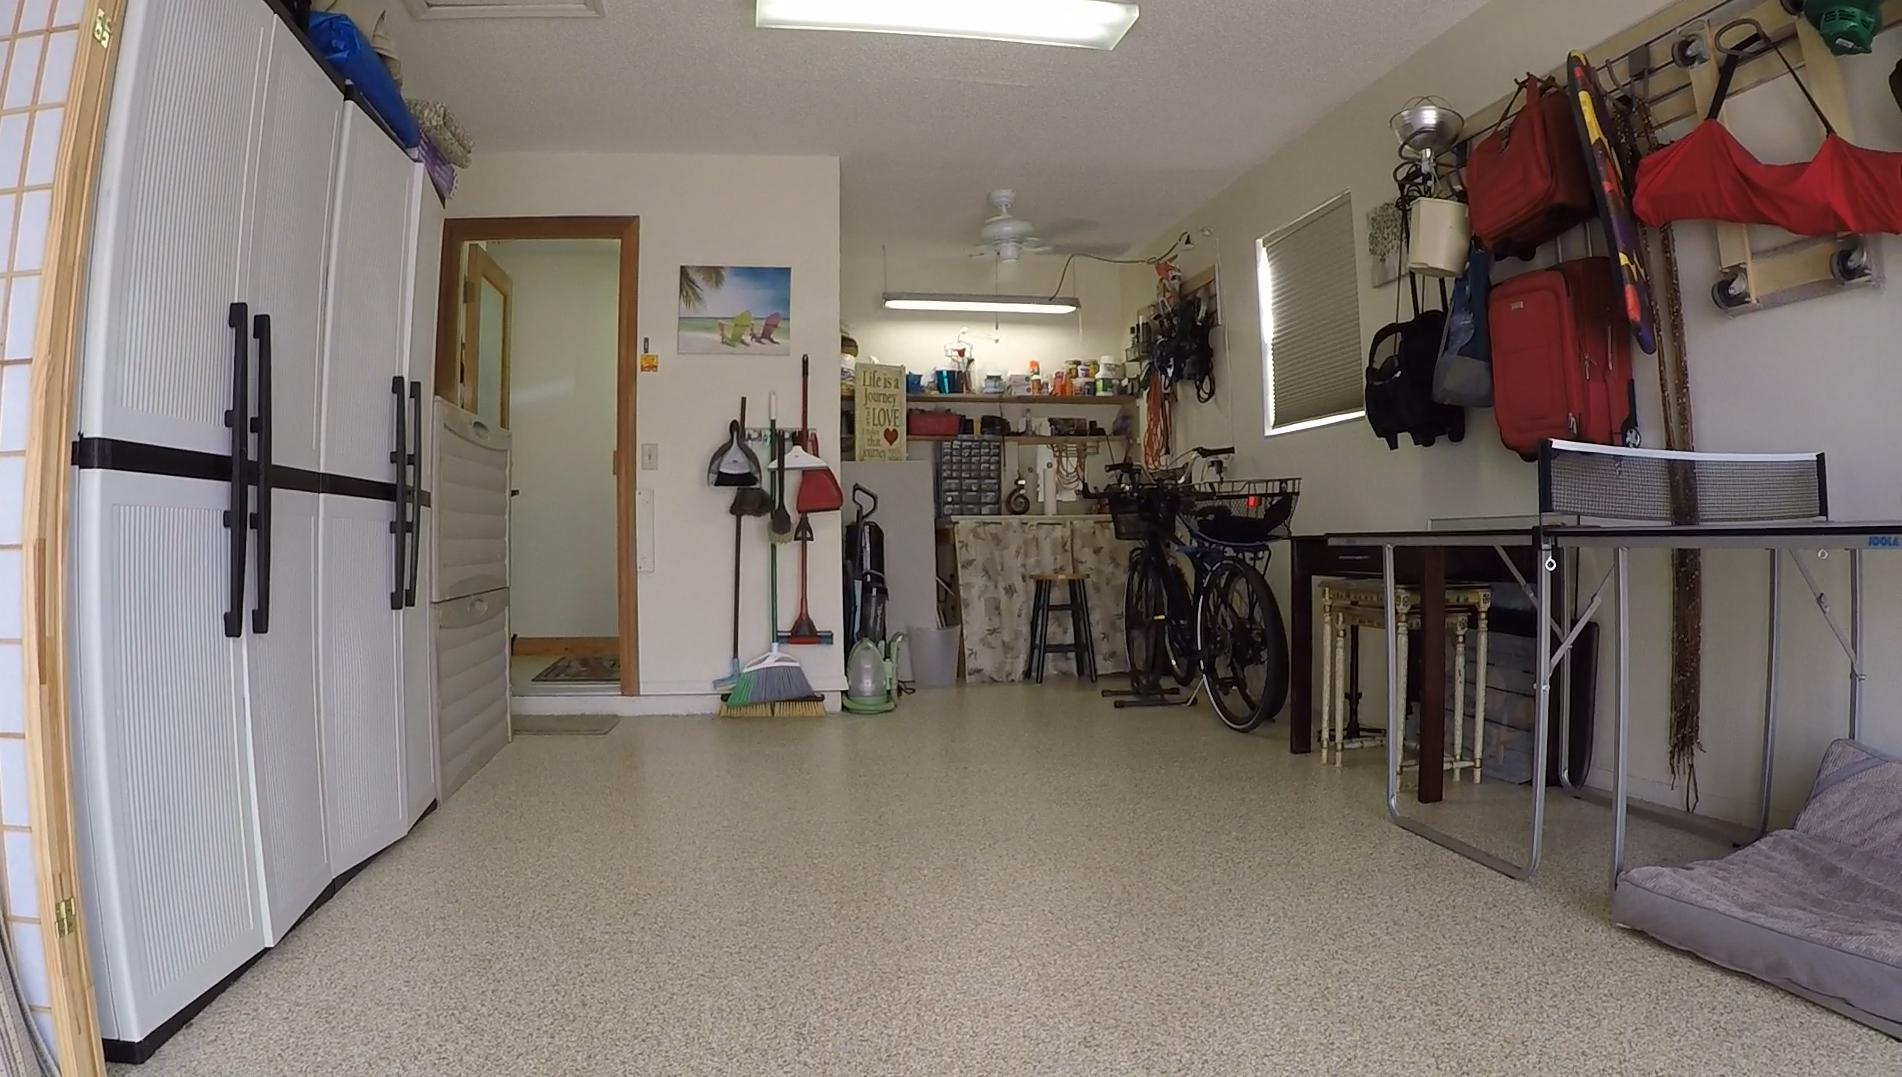 107 Falcon Road garage